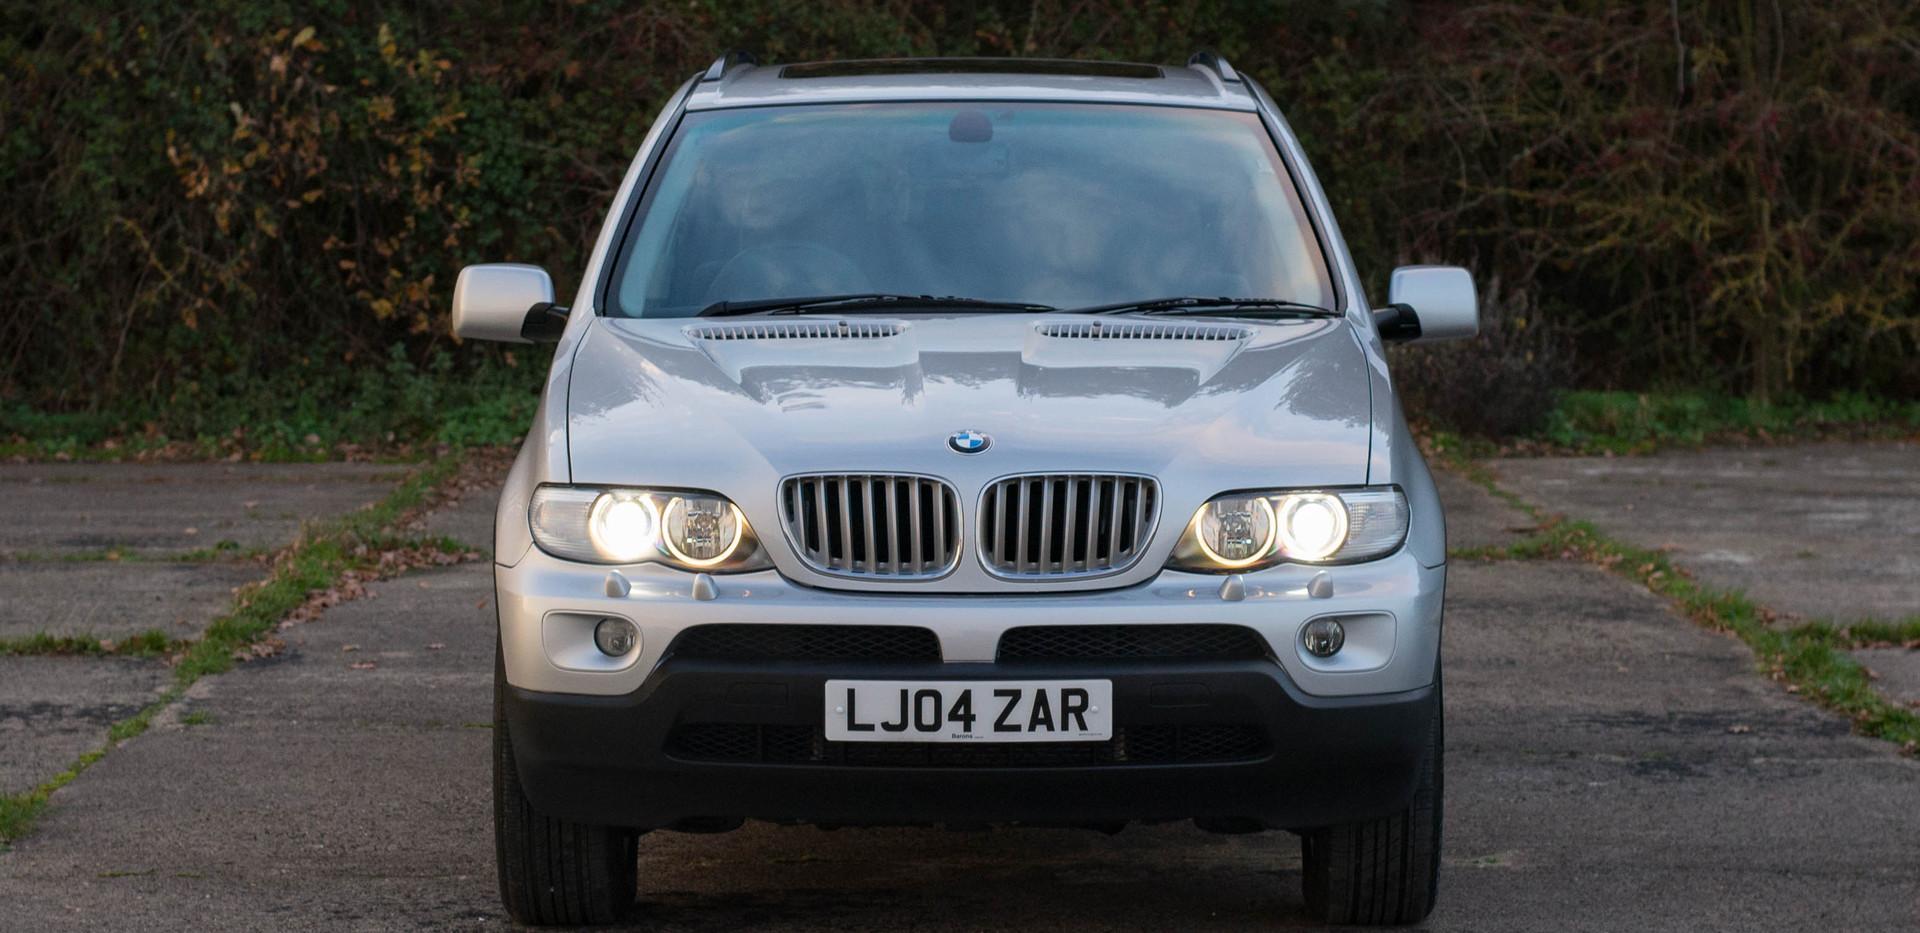 BMW E53 X5 4.4i For Sale UK London  (37